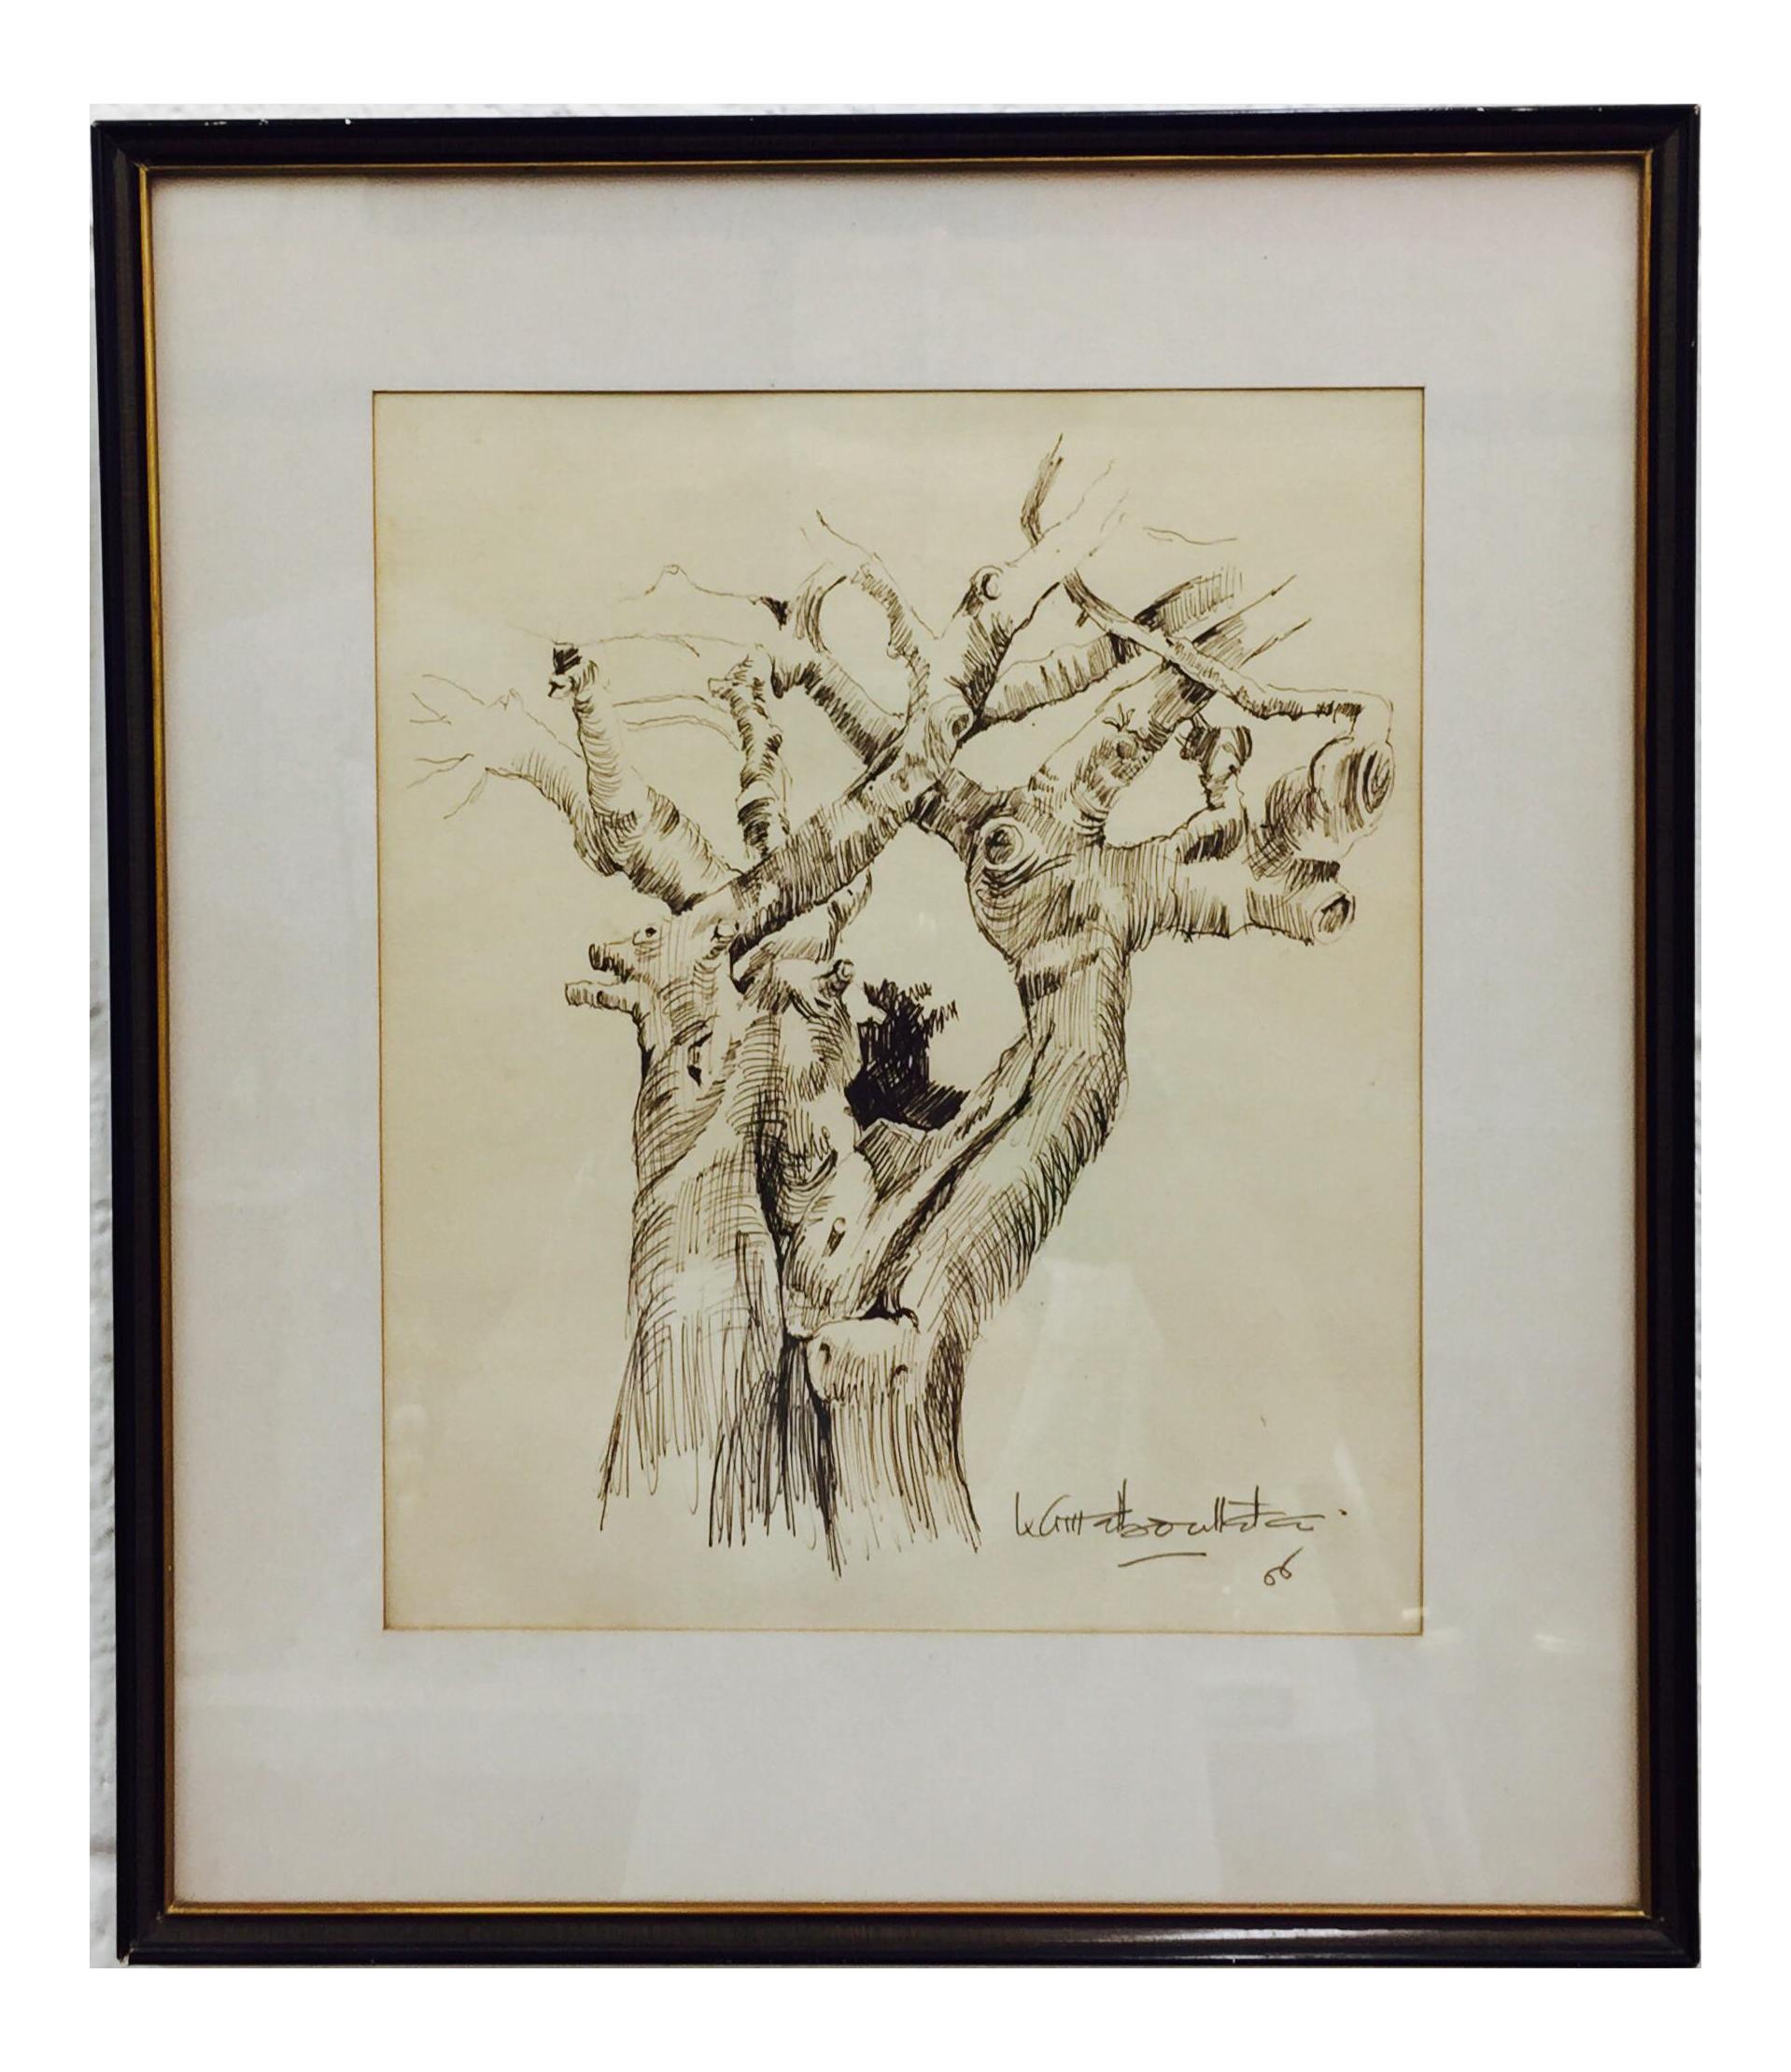 Black Gold Framed Tree Sketching Chairish